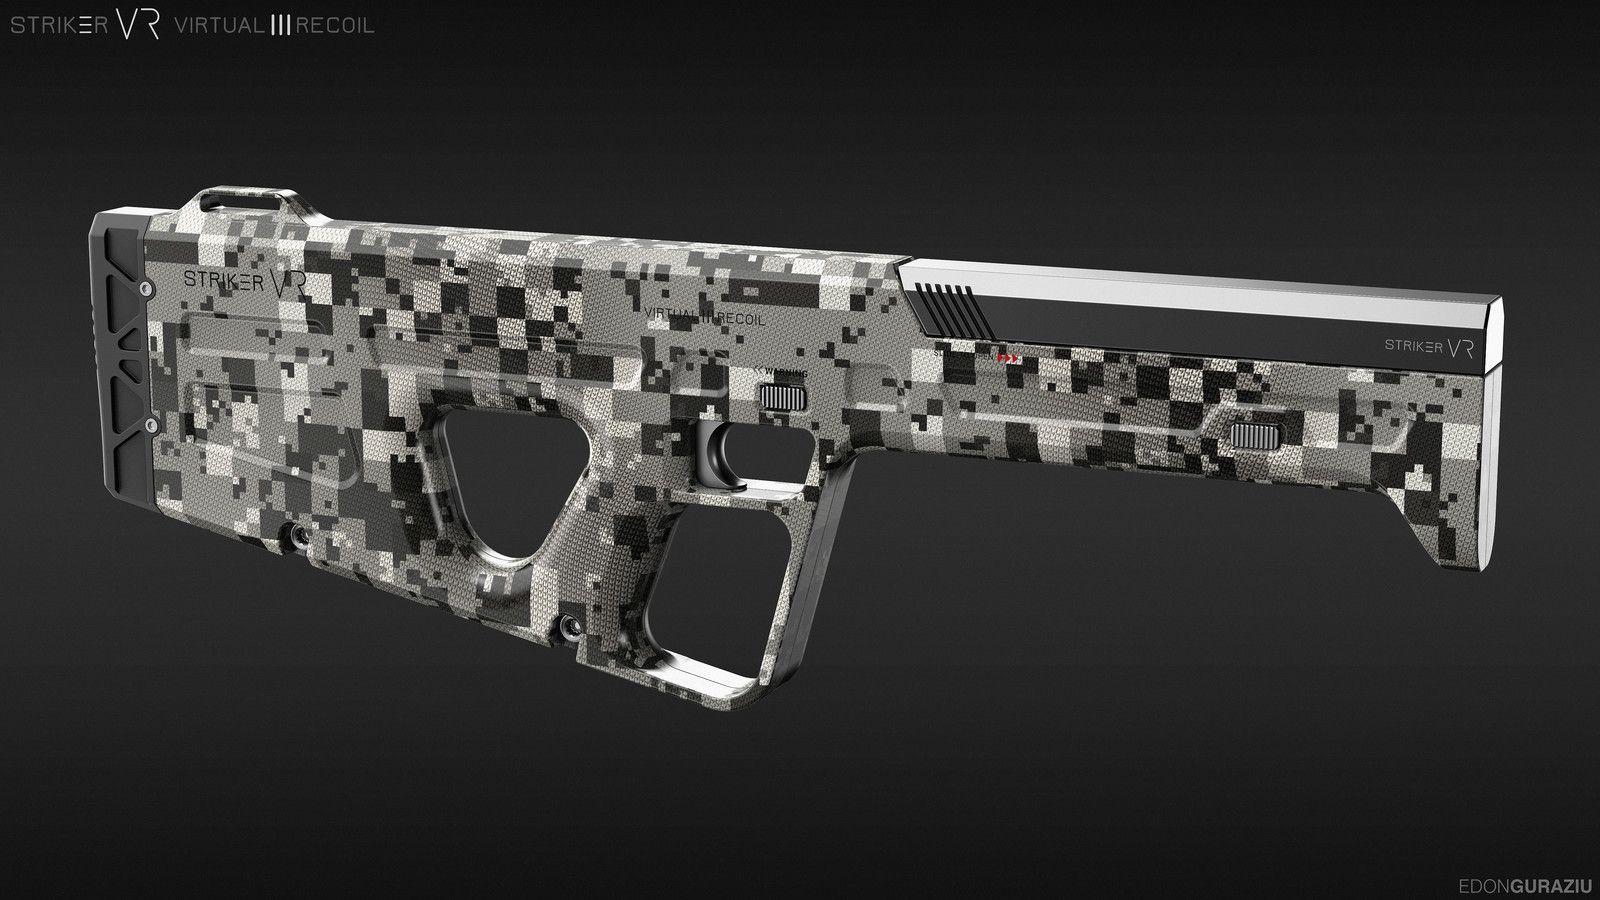 Striker VR Weapon Design, Edon Guraziu on ArtStation at https://www.artstation.com/artwork/WGAnG